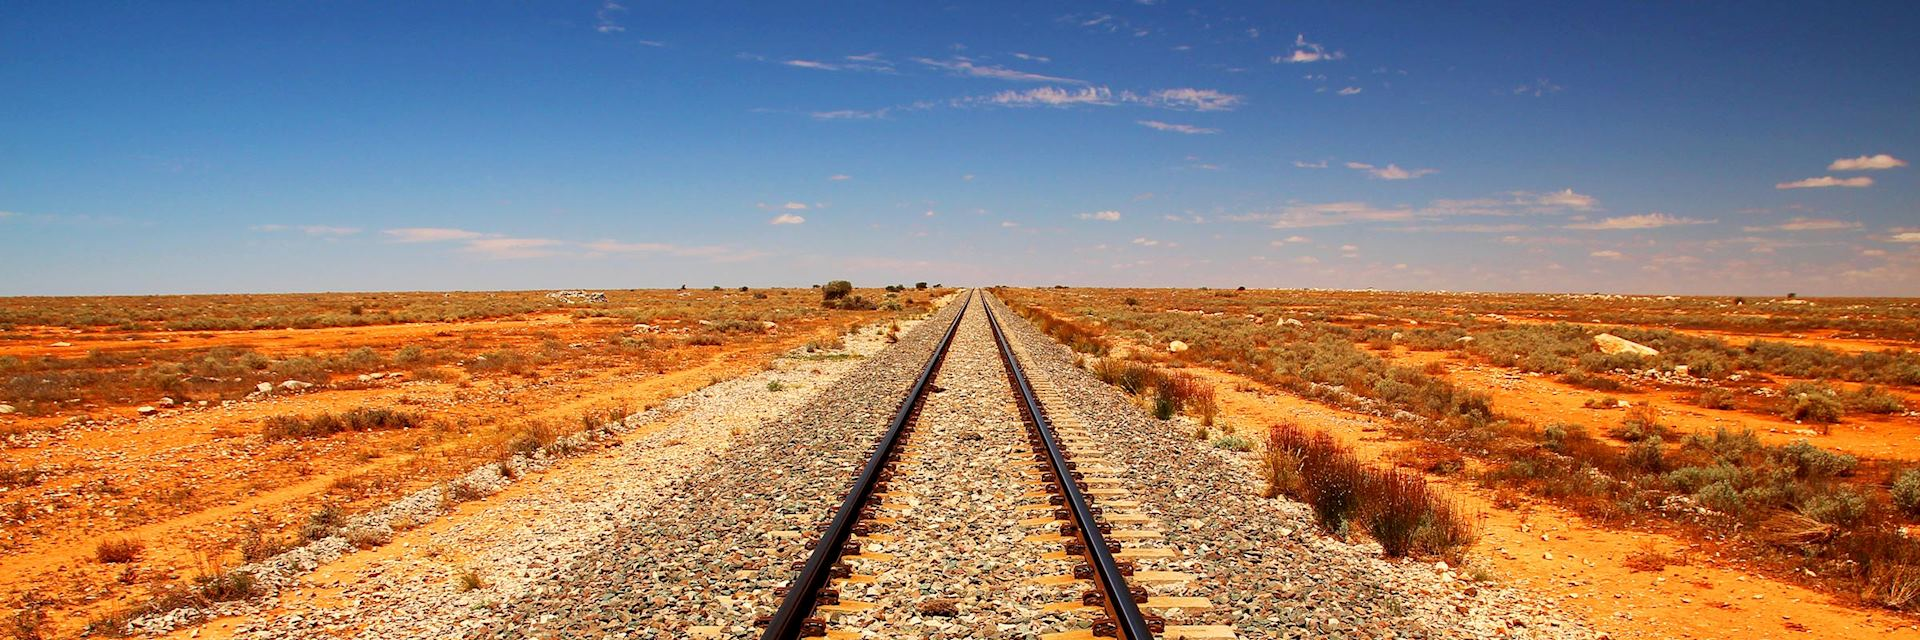 Train line in the Australian outback